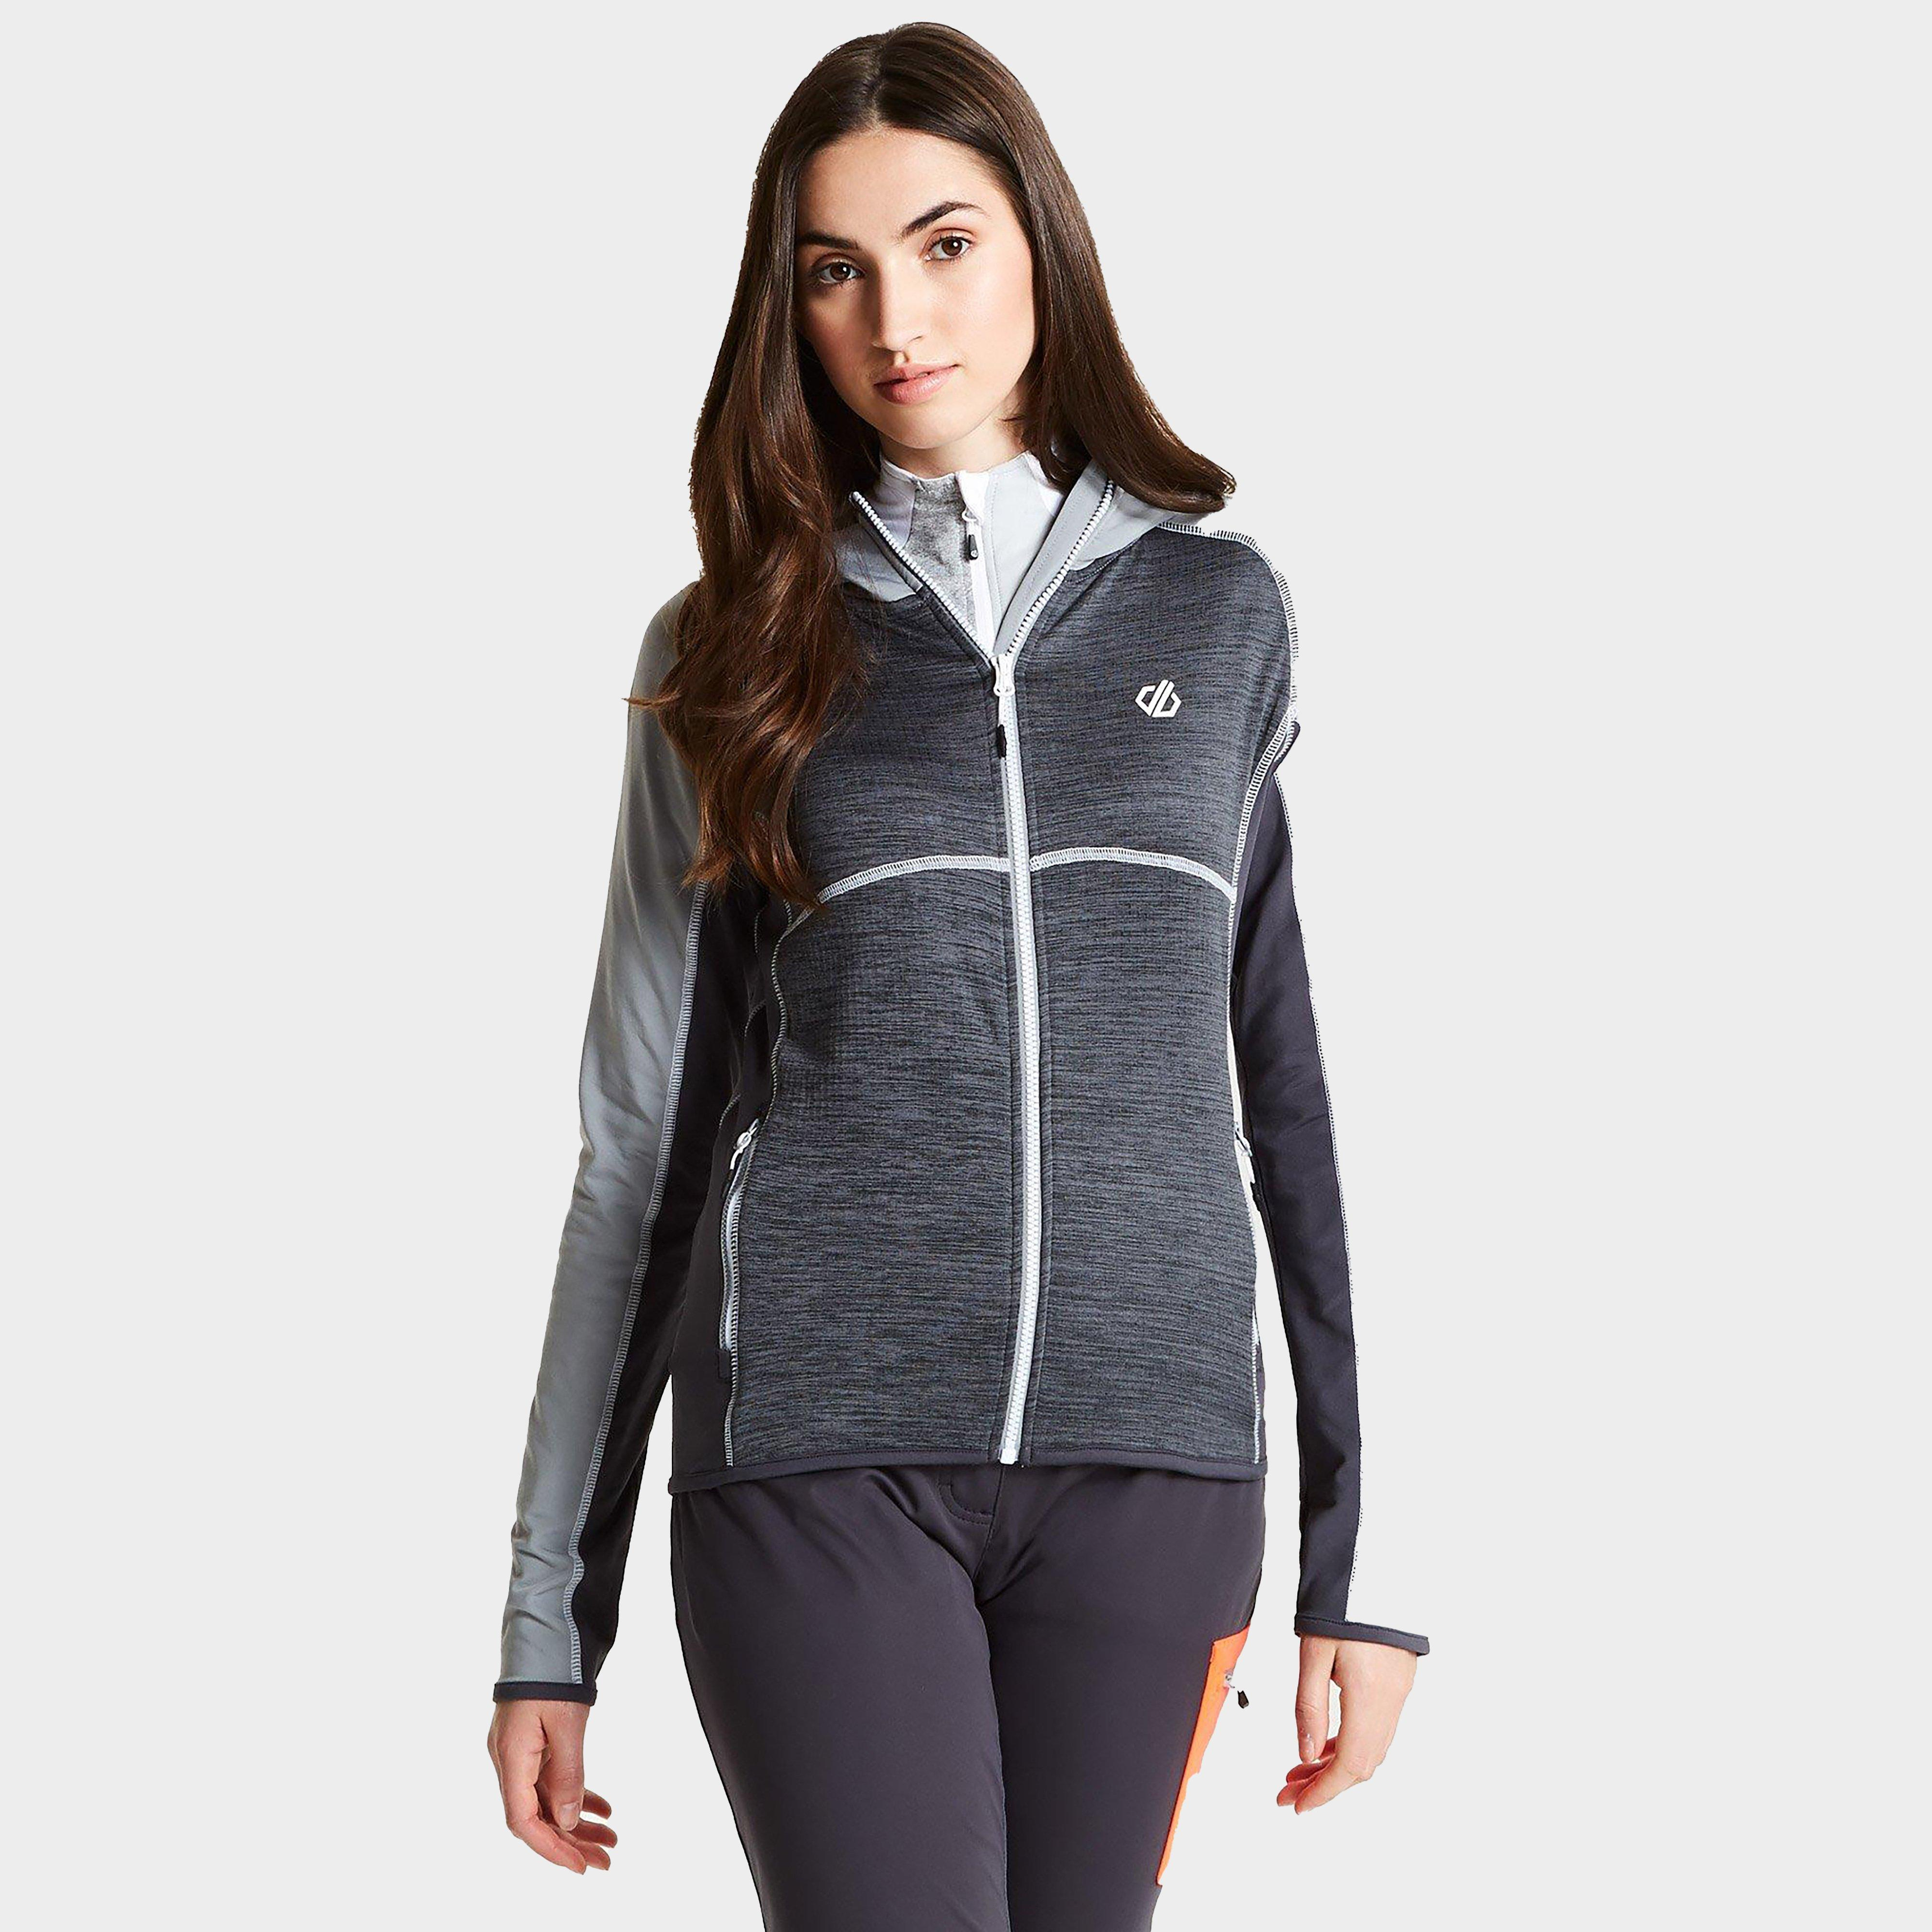 Dare 2b Dare 2B Womens Courteous Hooded Core Stretch Ski Midlayer - Black/Grey, Black/Grey